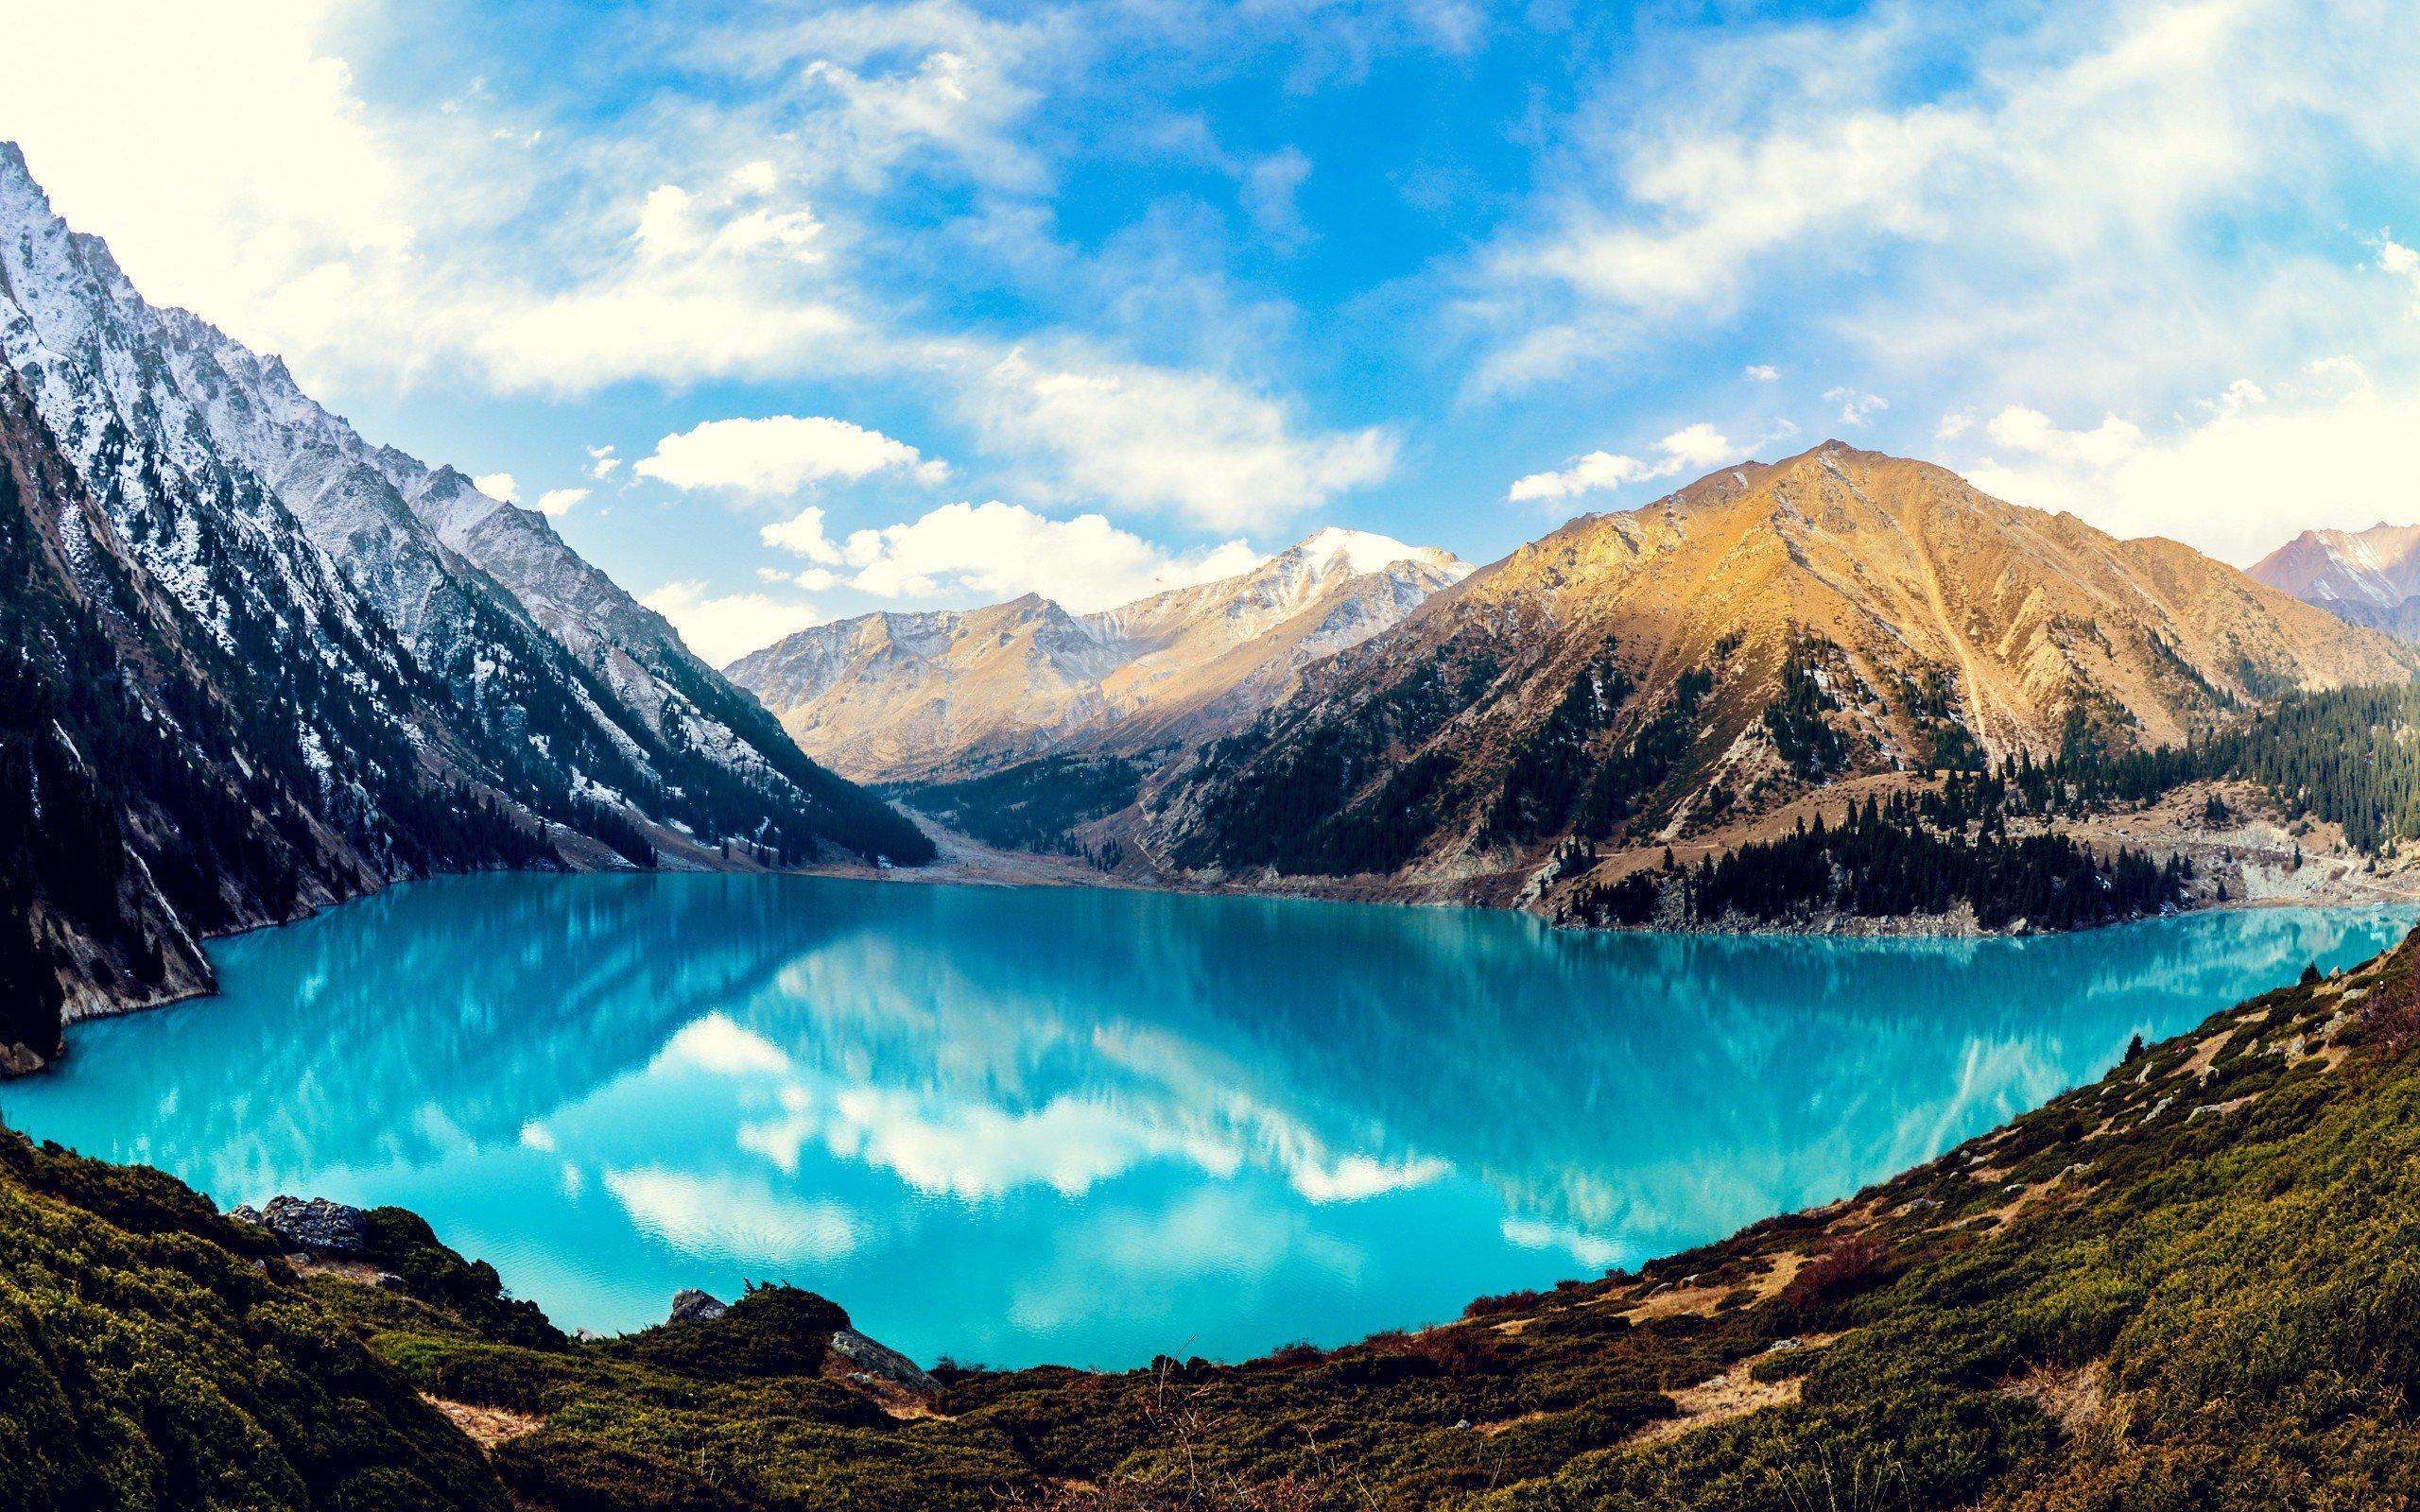 Big Almaty Lake Hd Nature 4k Wallpapers Images